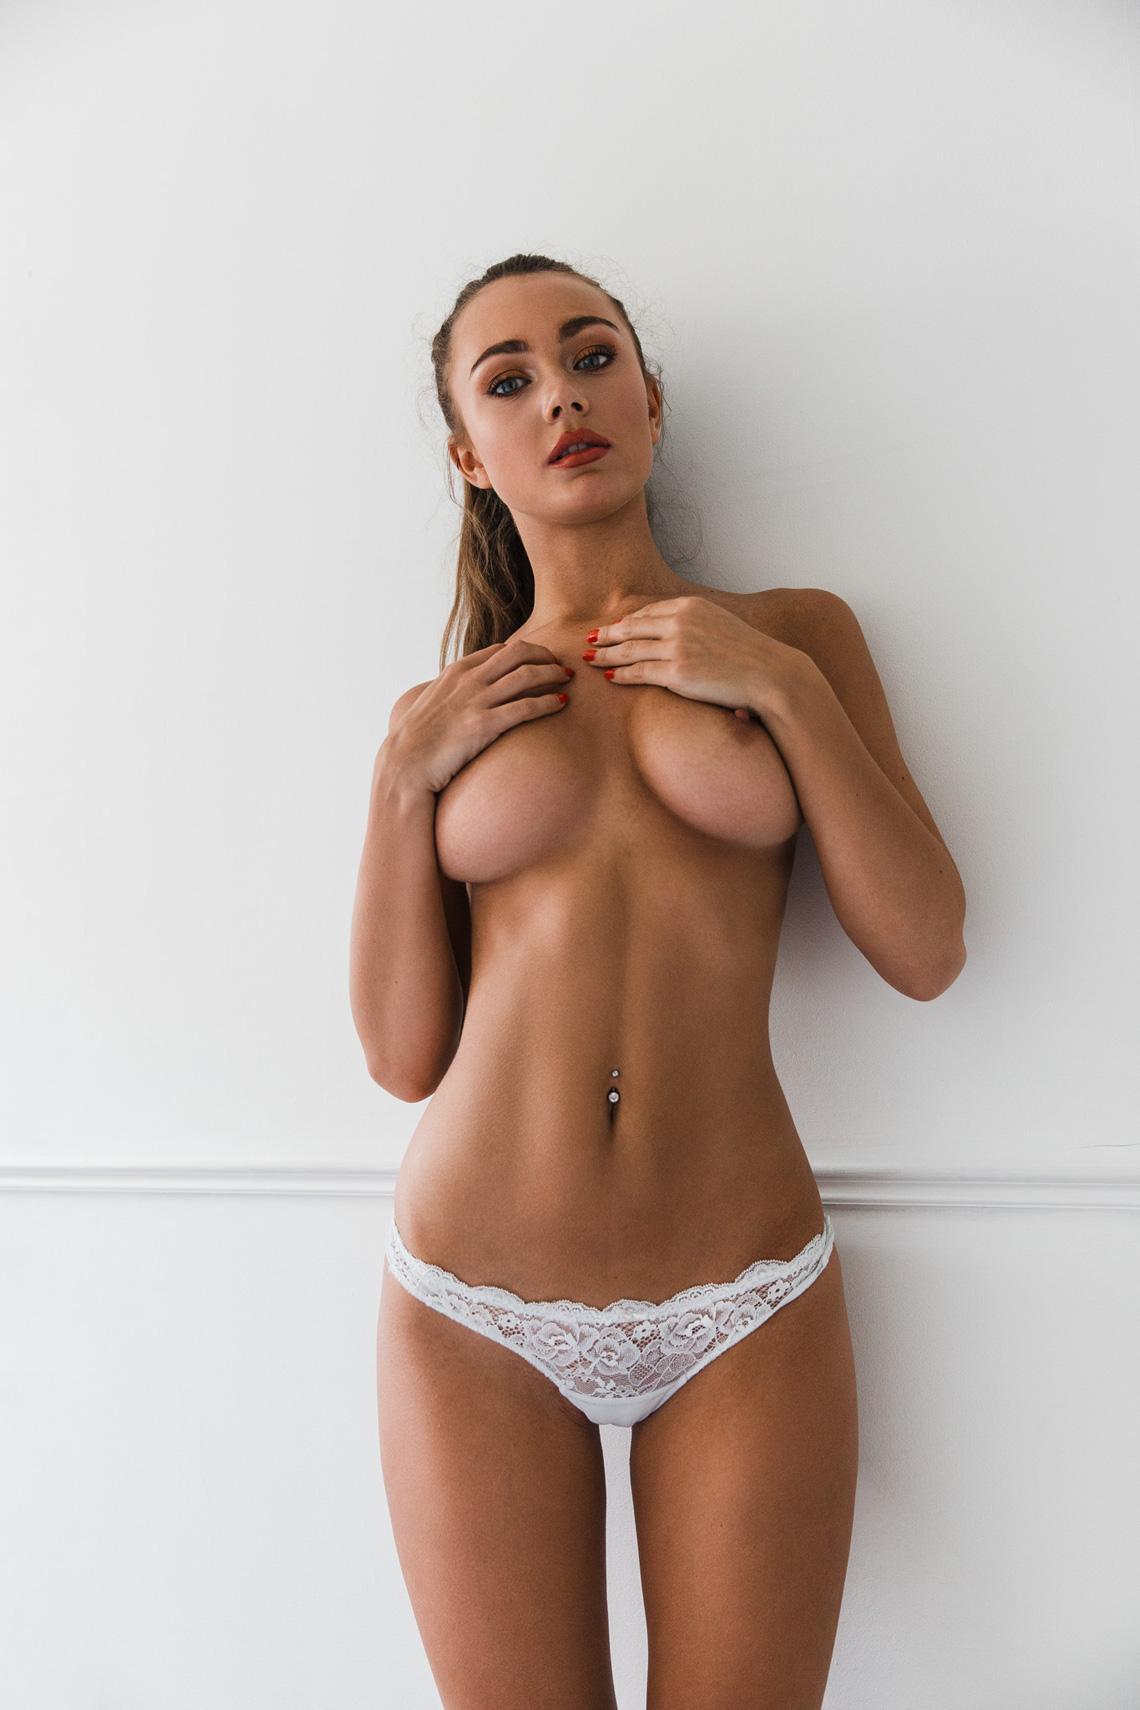 courtney knox nude